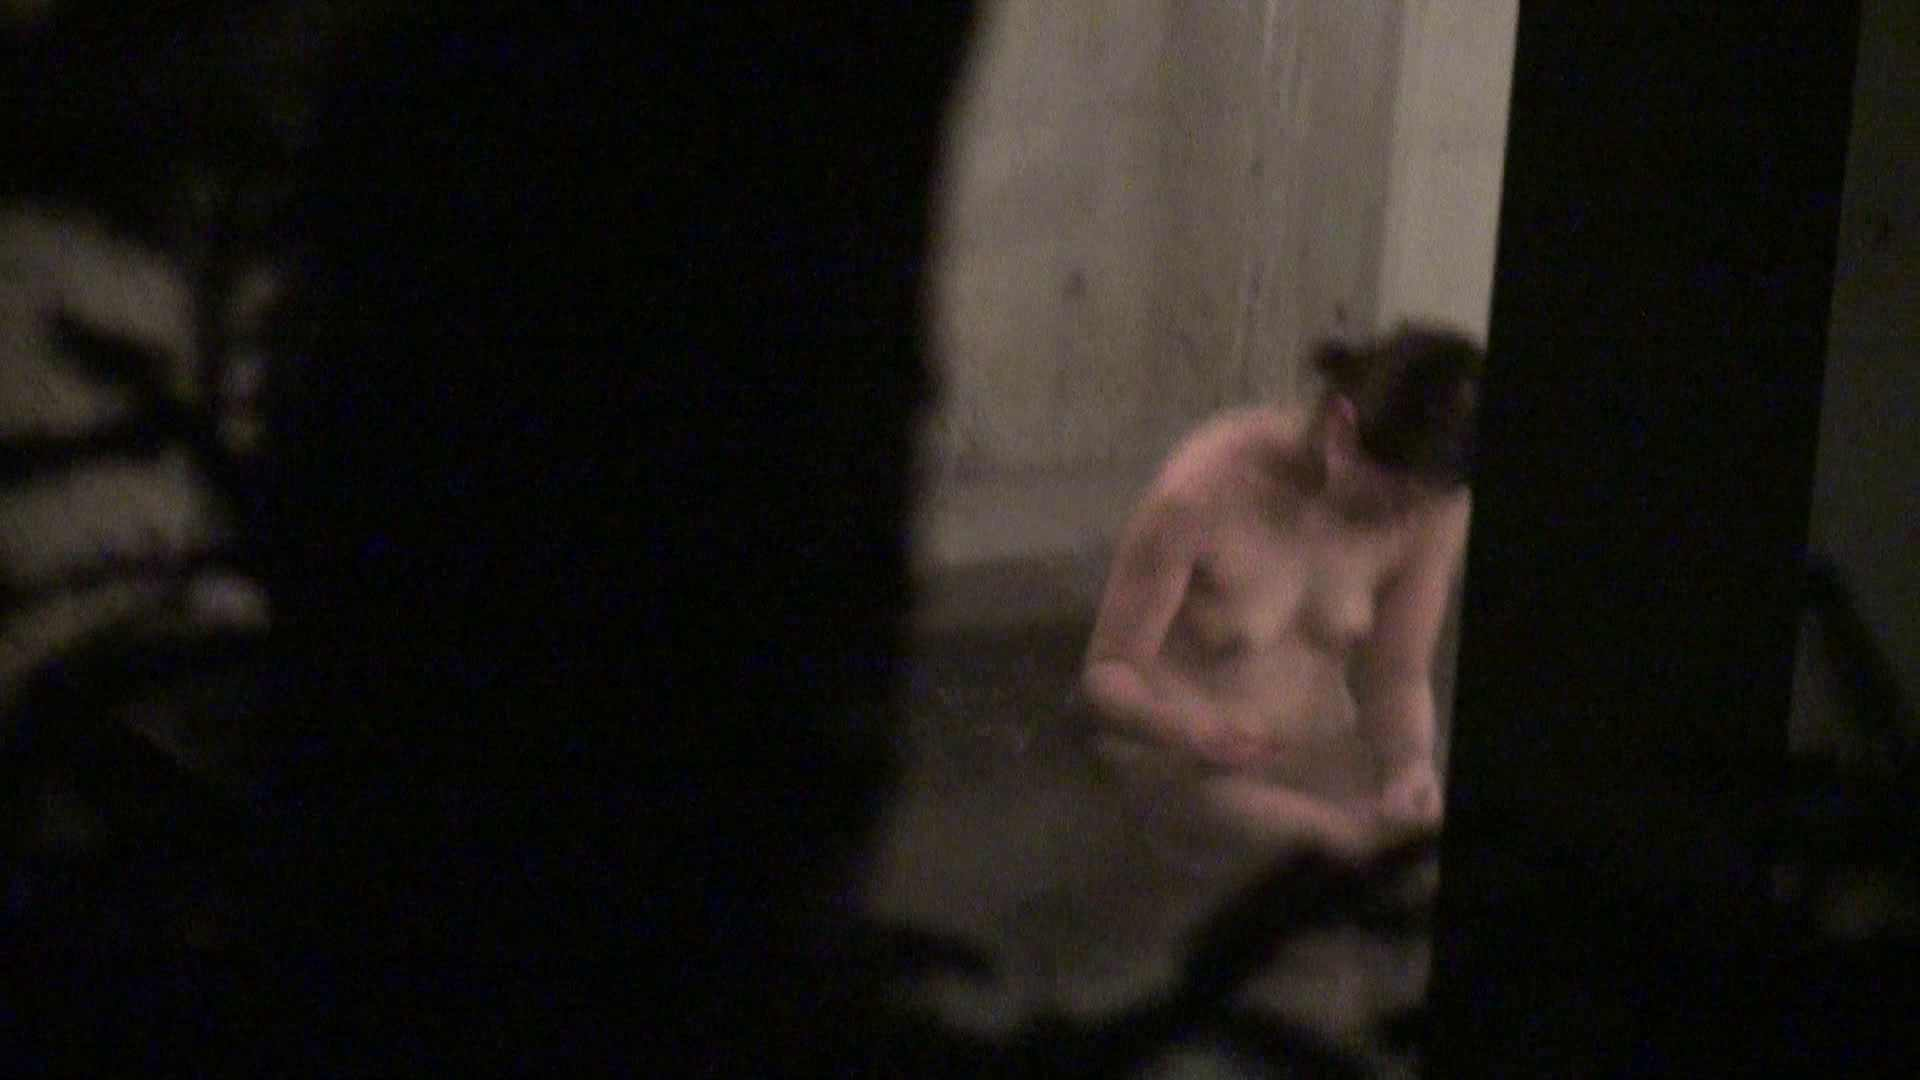 Aquaな露天風呂Vol.426 OLセックス 盗み撮りオマンコ動画キャプチャ 106画像 29